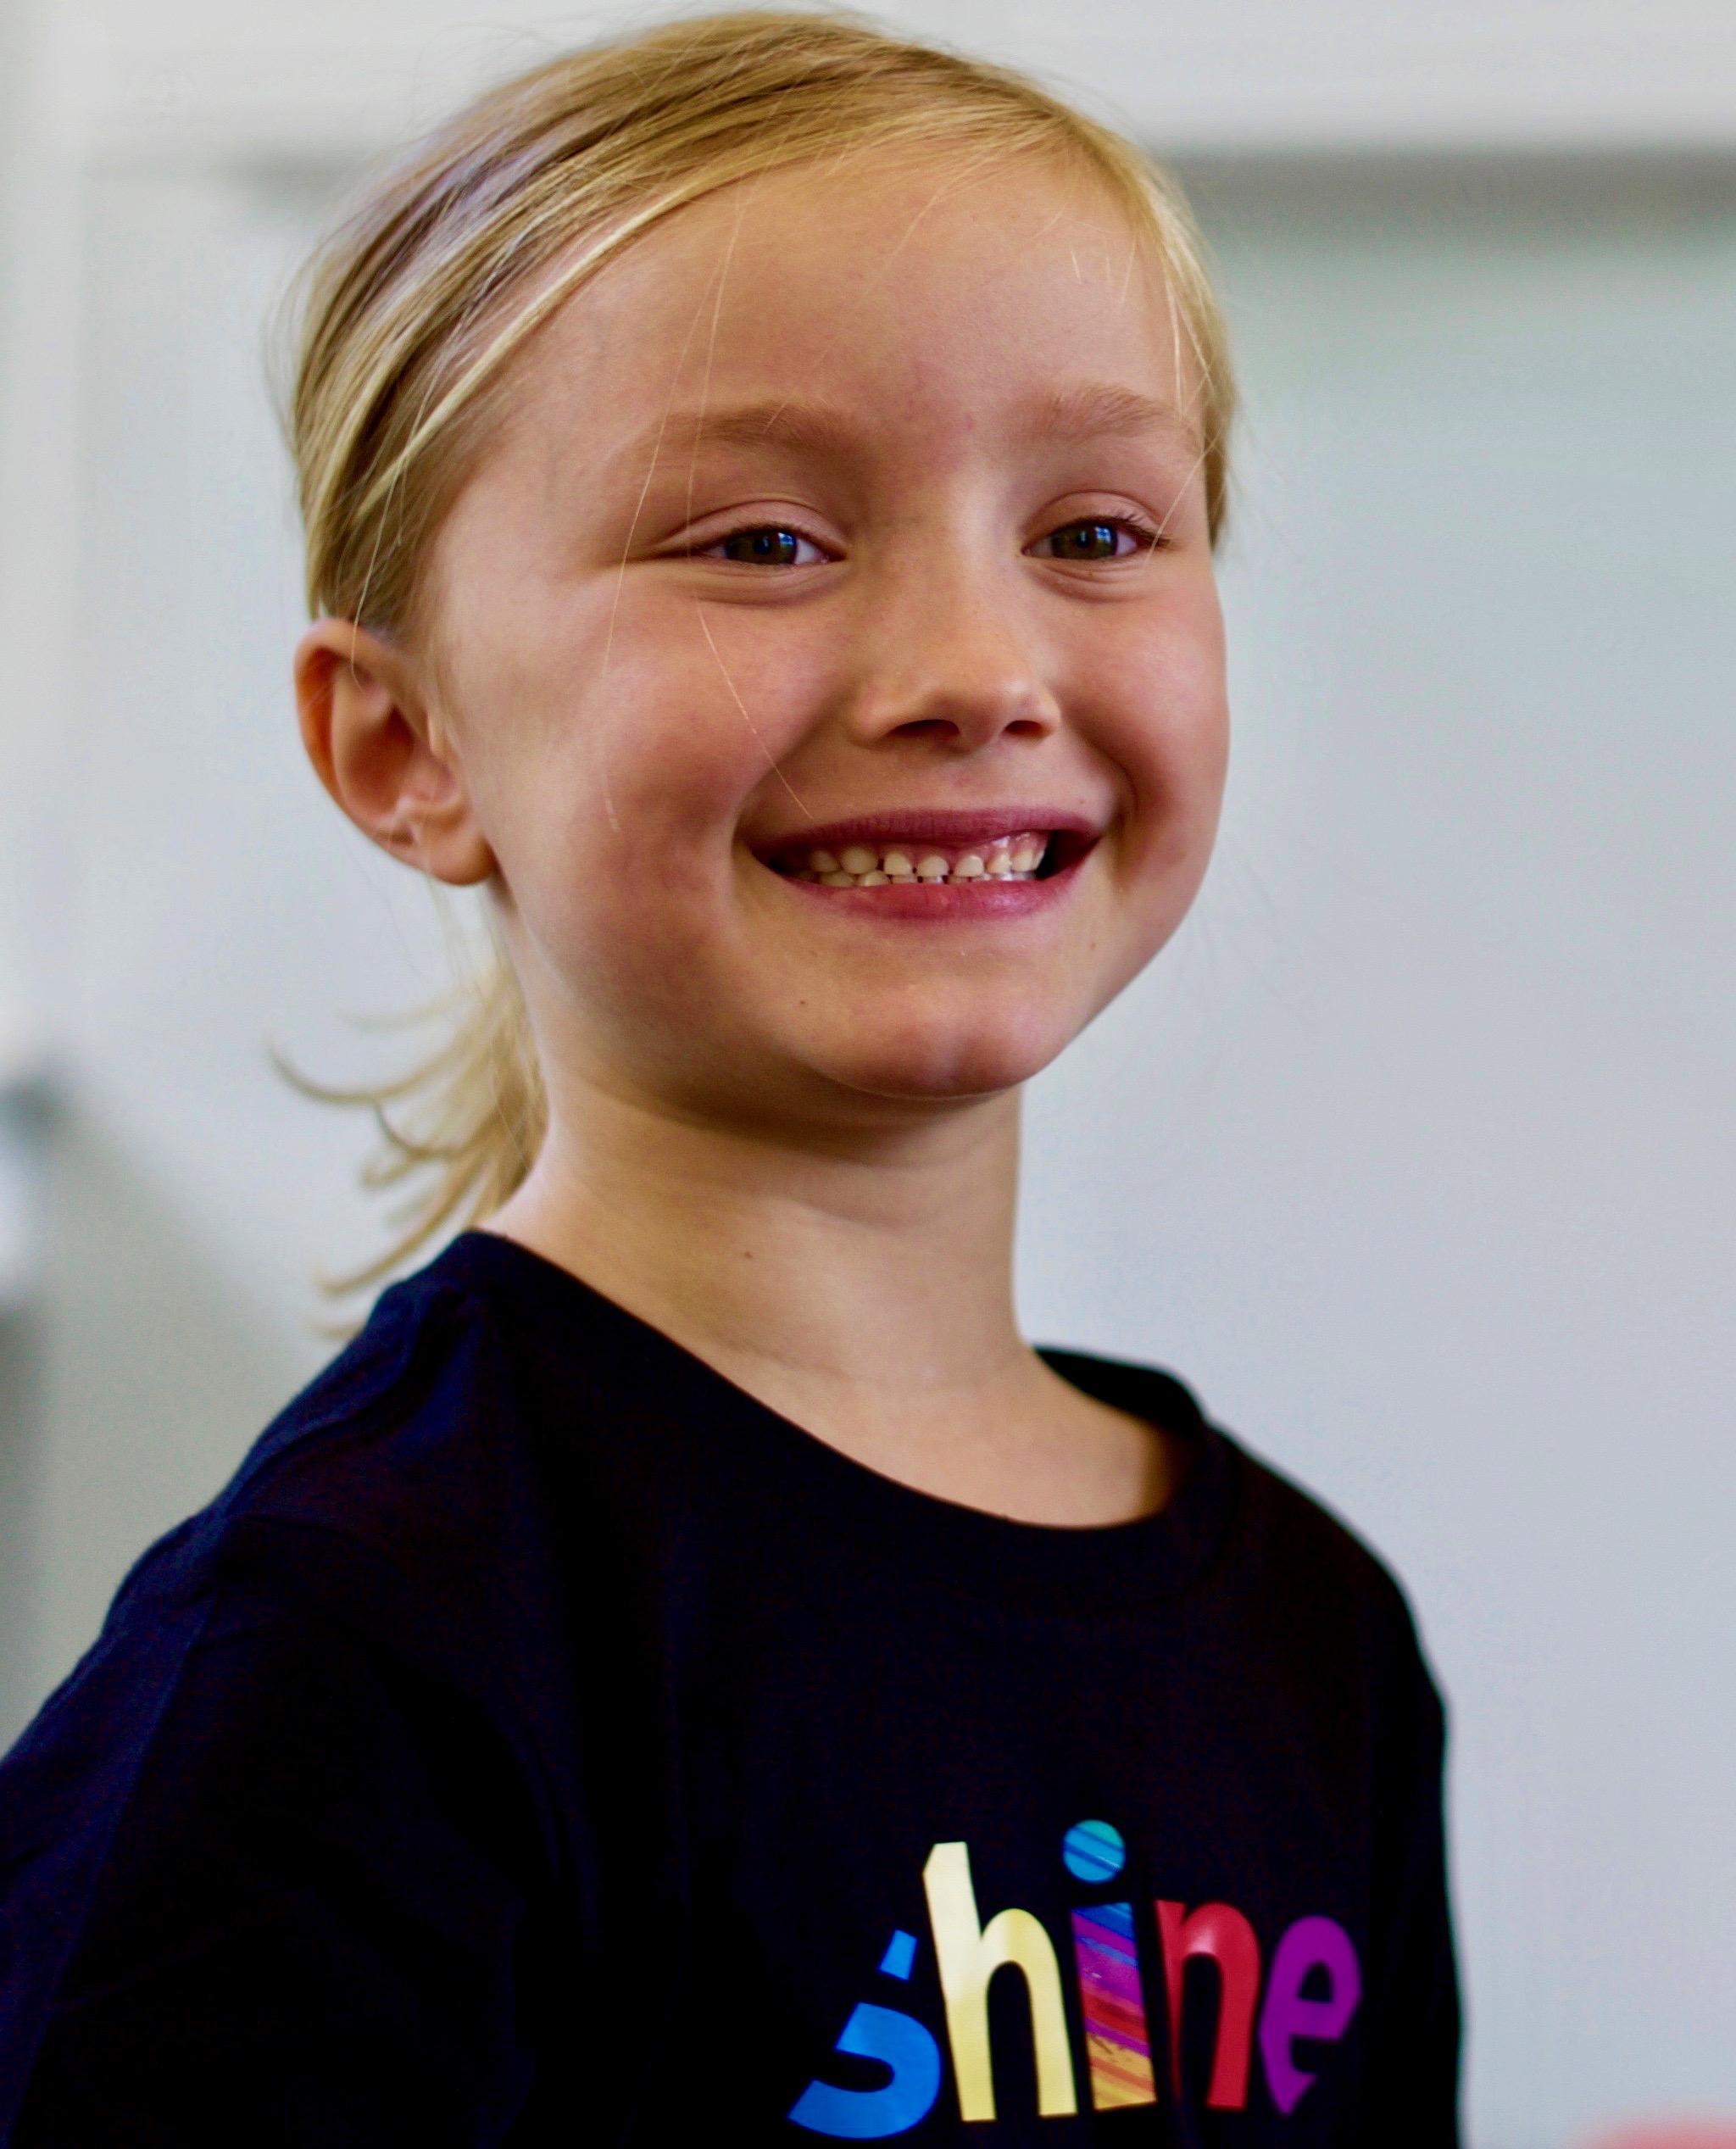 Eva in blacl Shine t-shirt 2.jpg